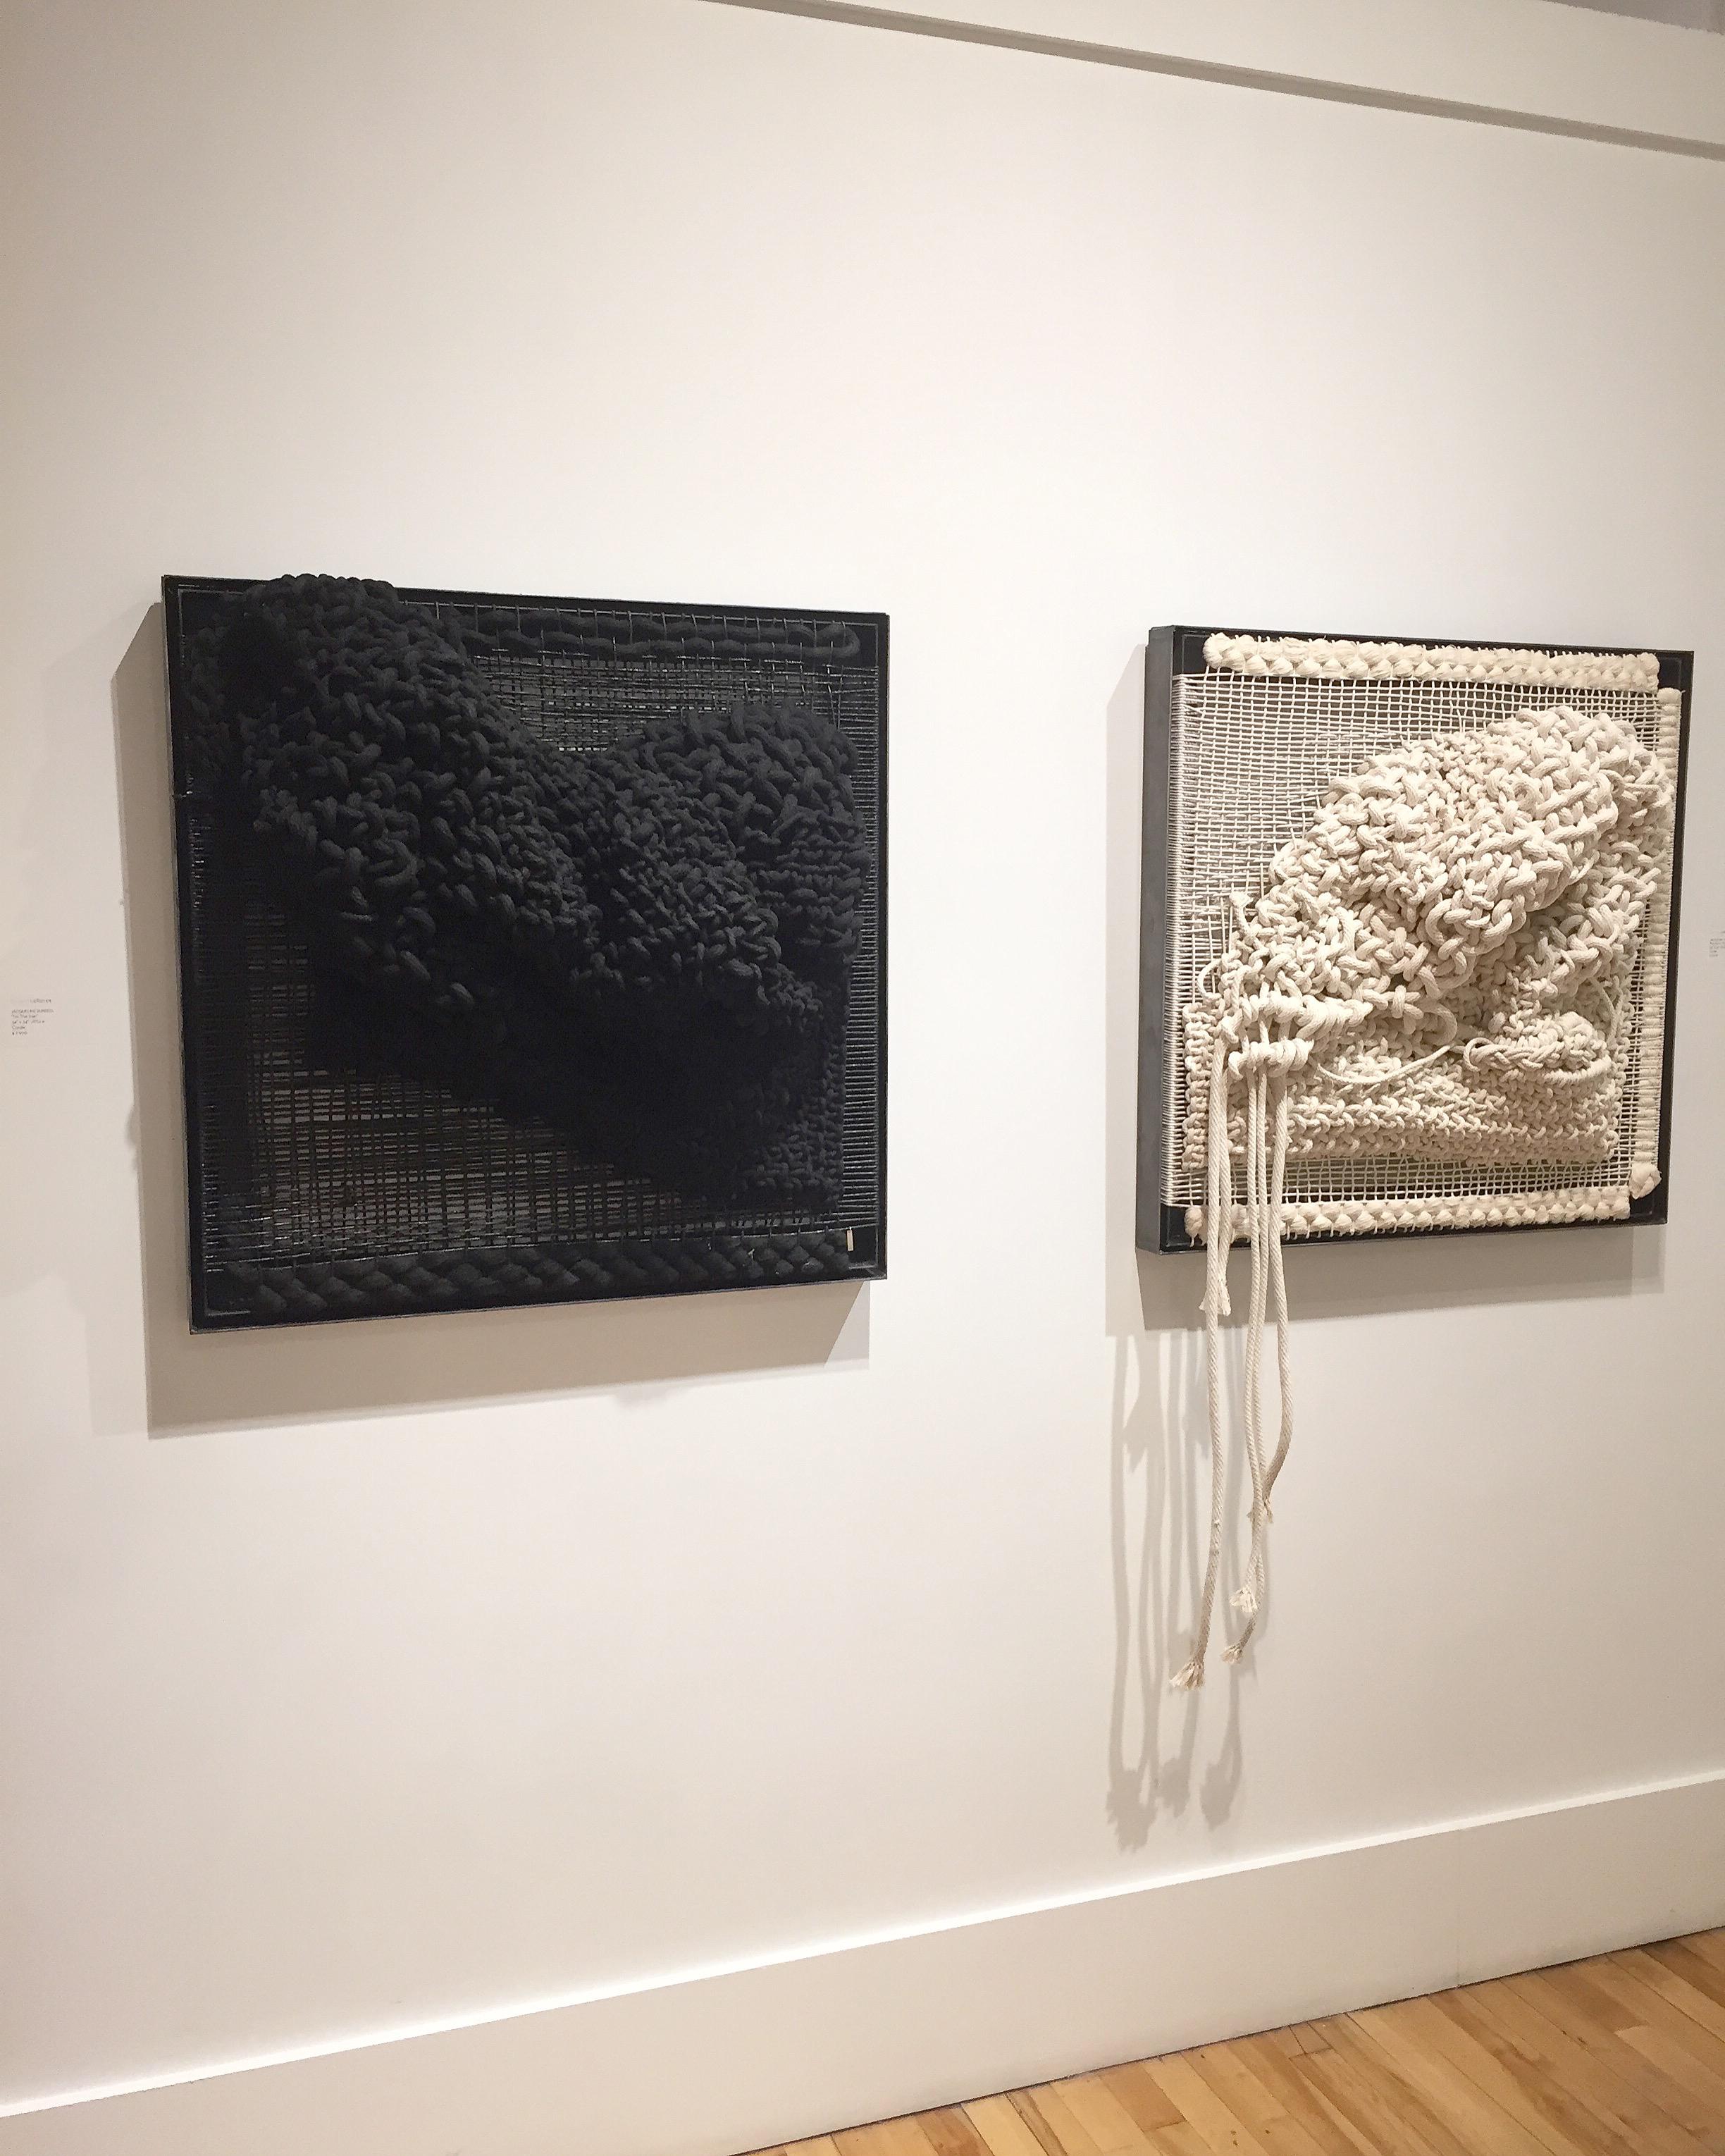 Jacqueline-Surdell-Artist-Sculpture-Lets-Be-Stars-09.jpg